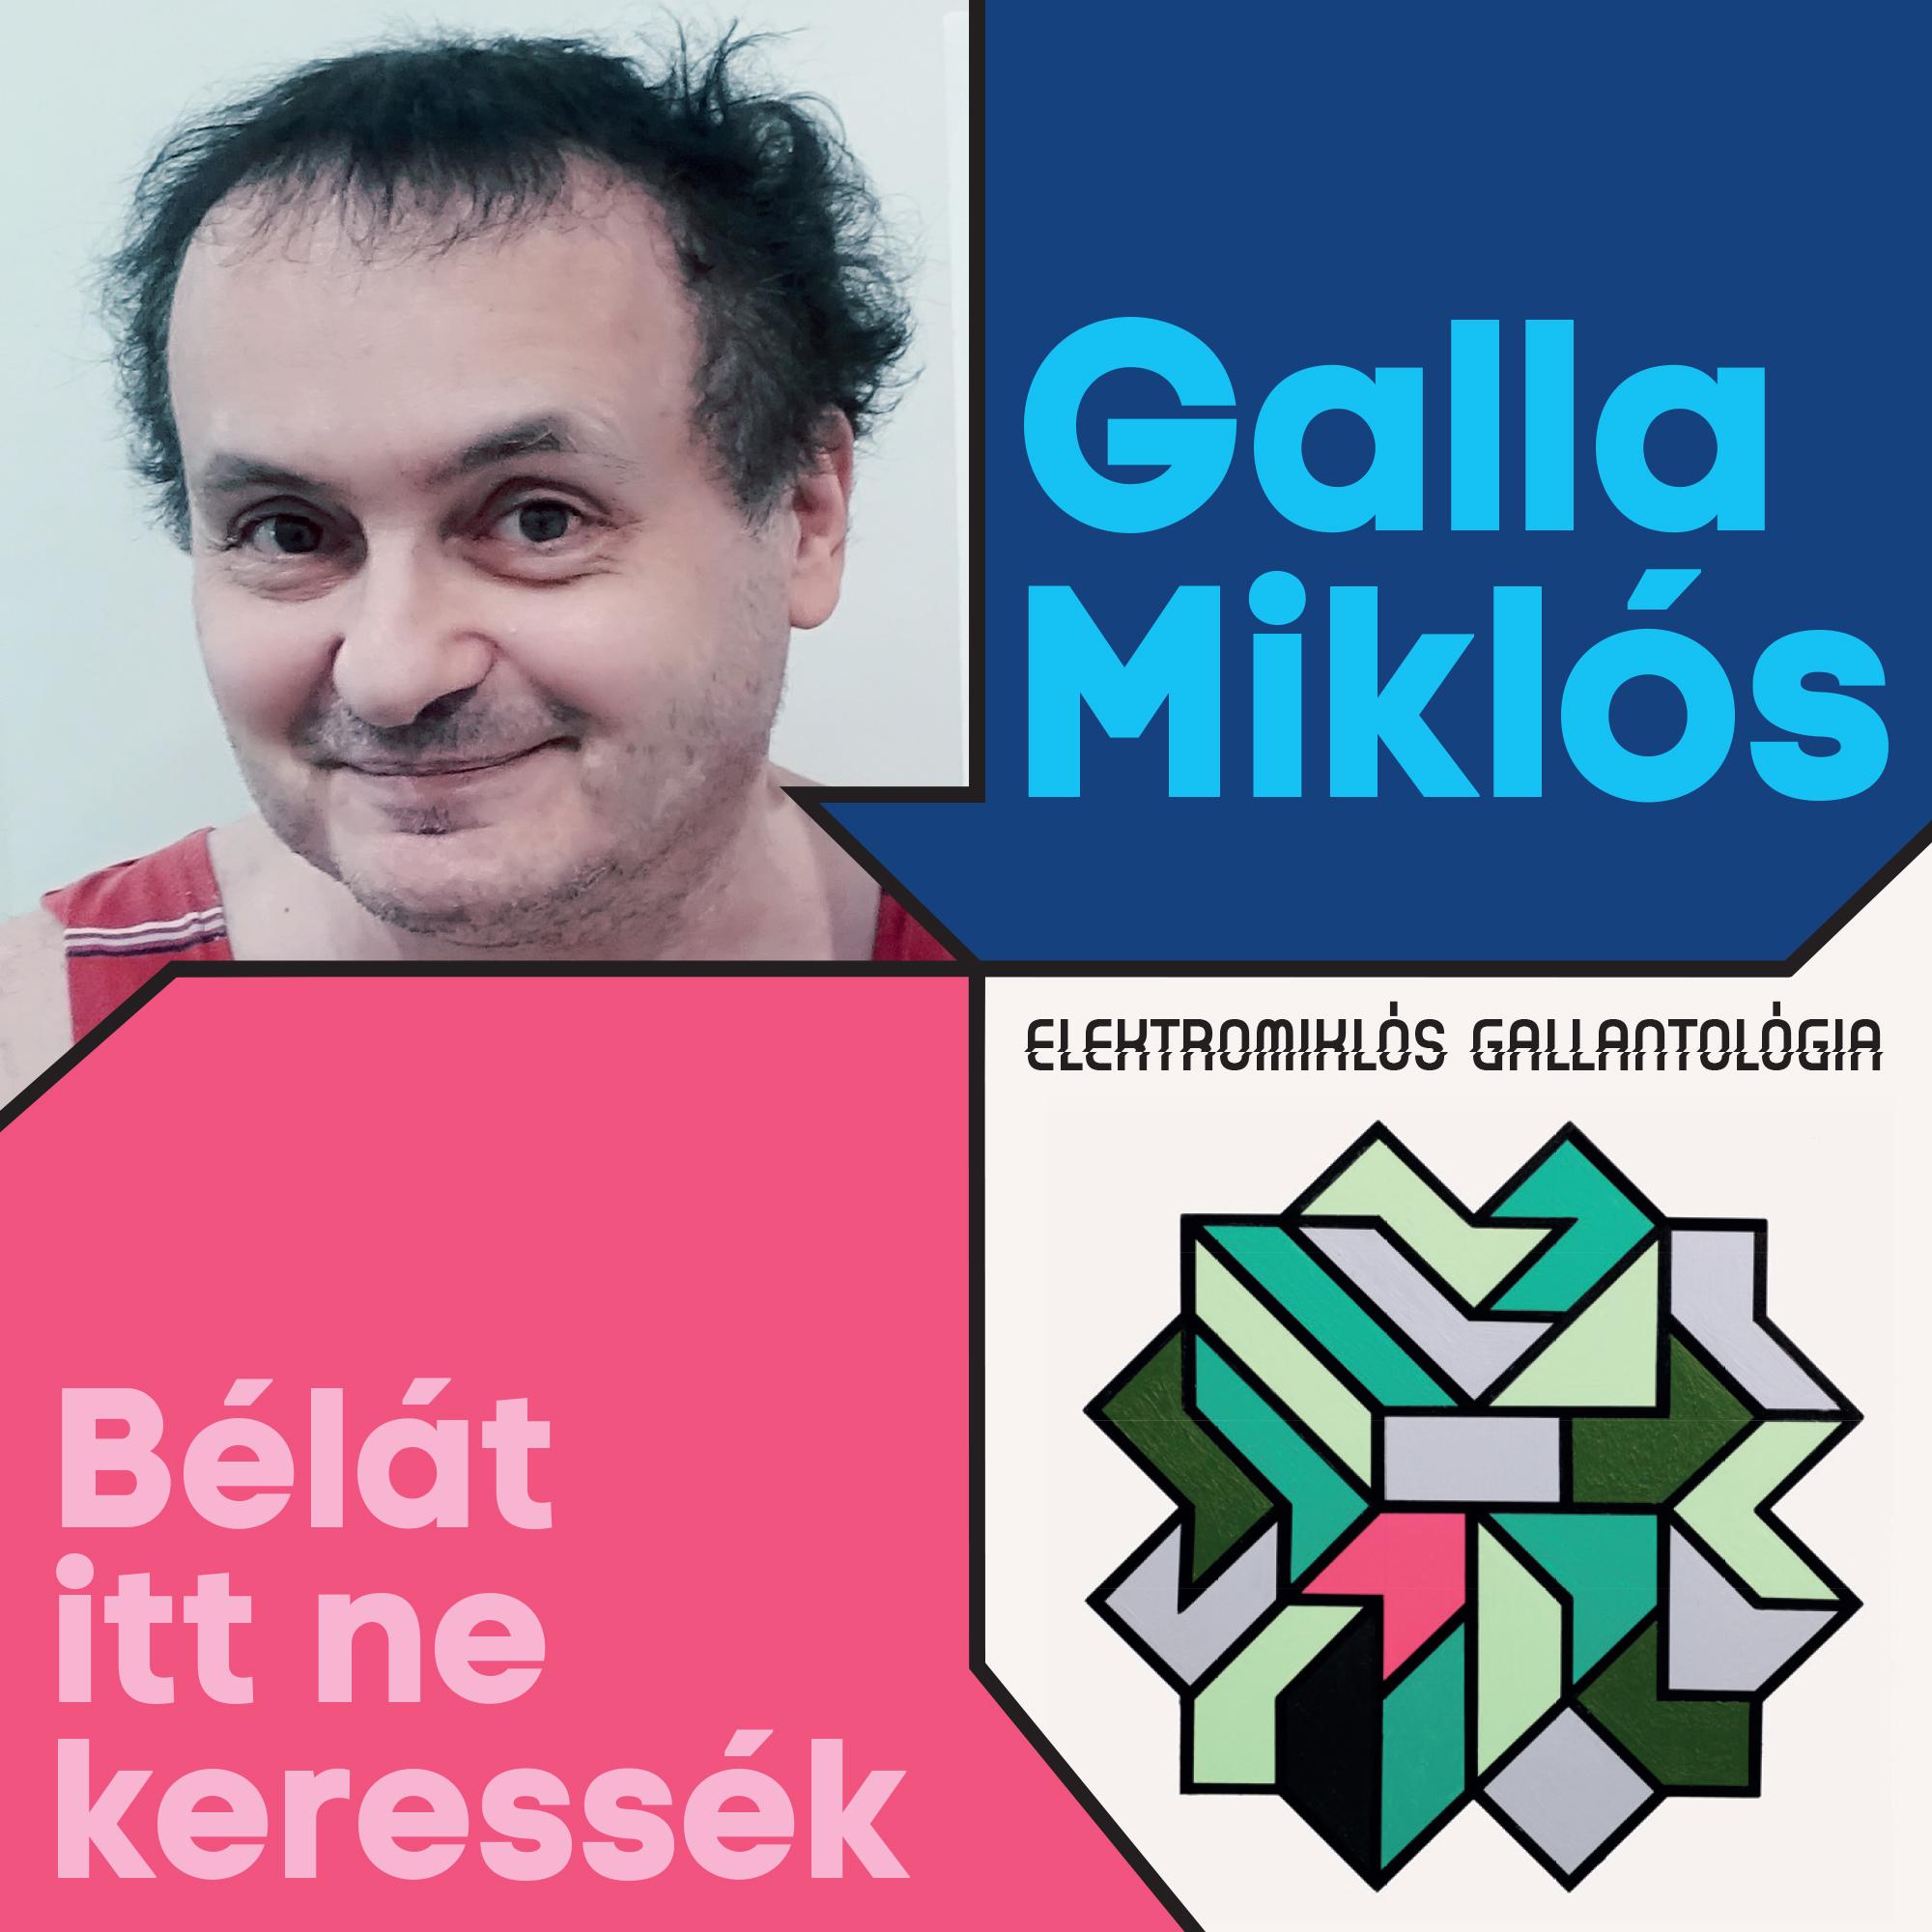 galla_miklos_belat_itt_ne_keressek_cover_2000.jpg